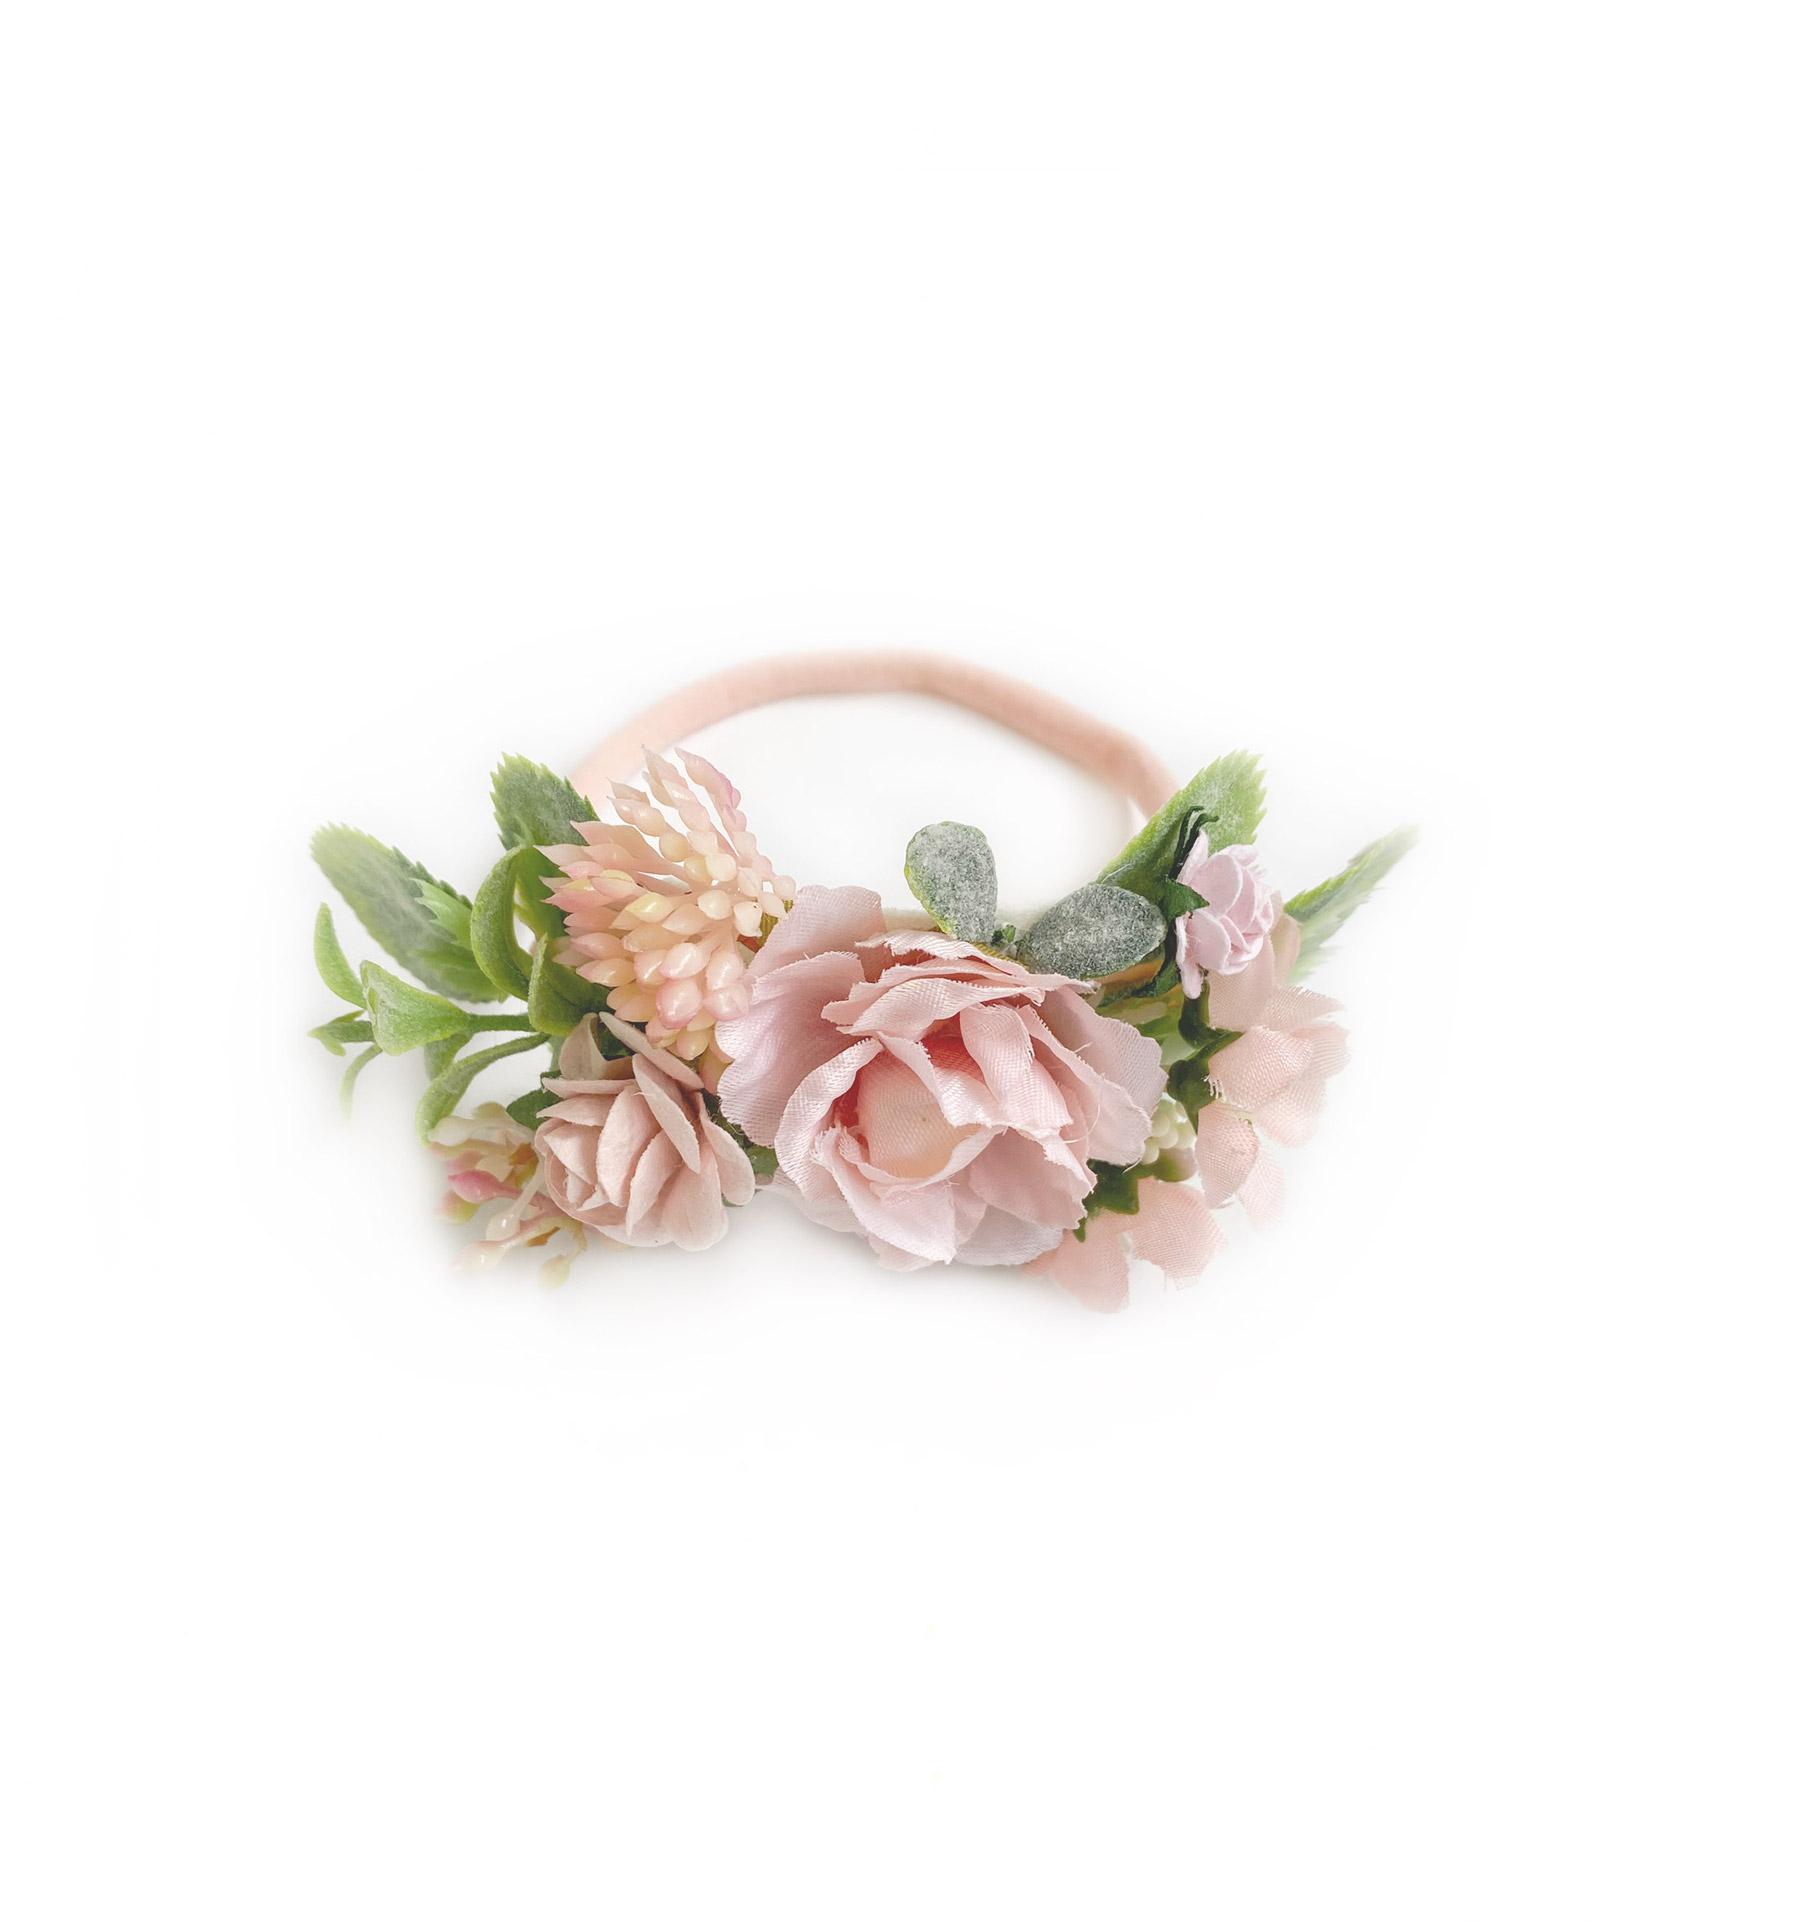 Cora Floral Stretch Headband